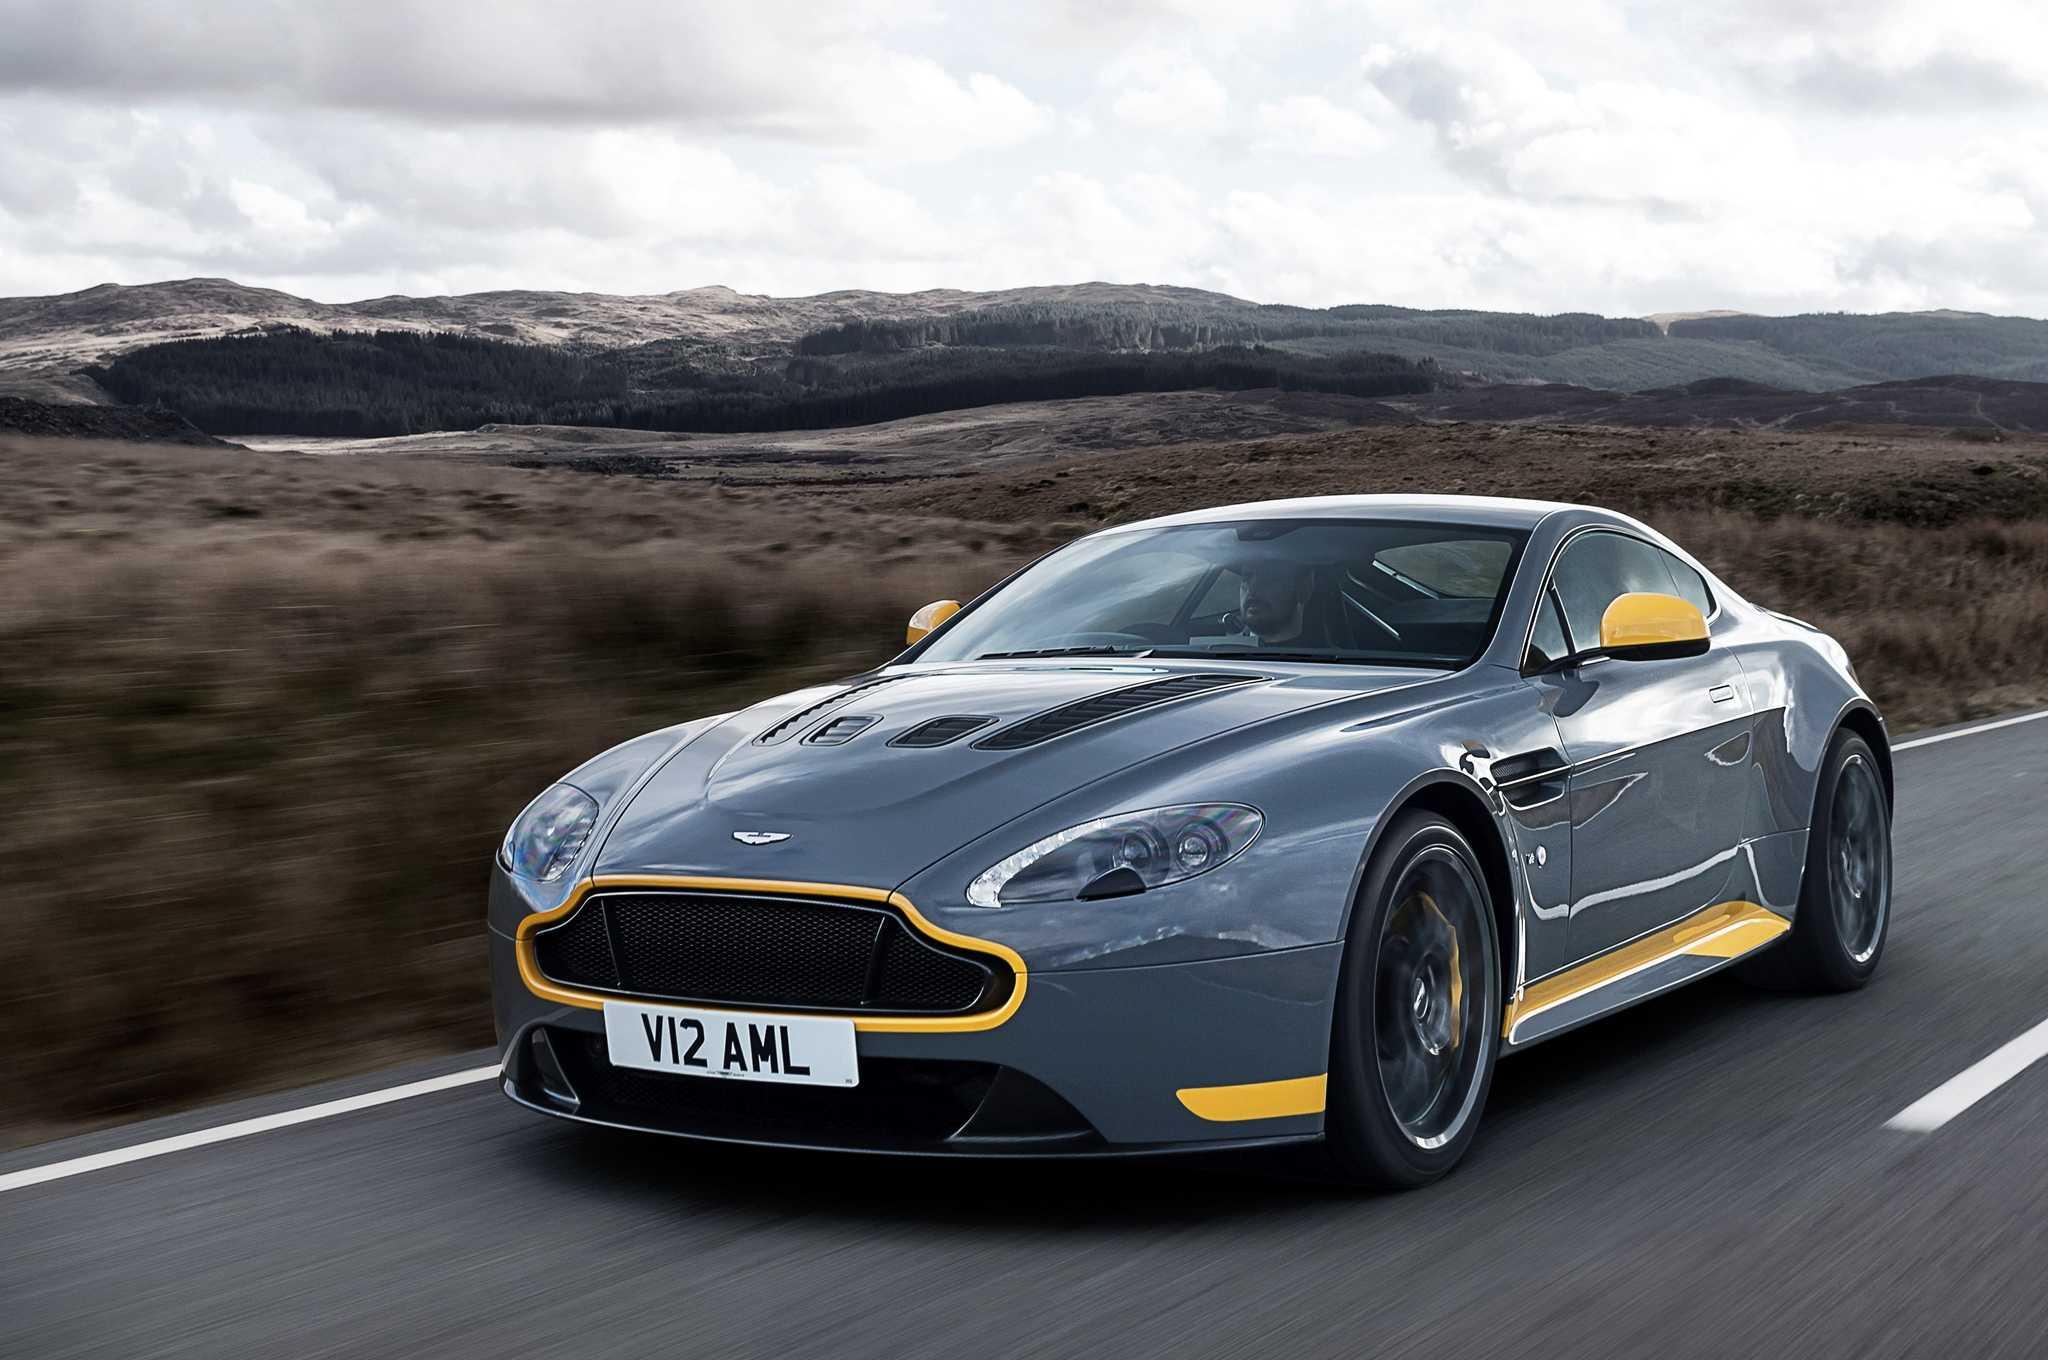 Aston Martin V Vantage GTS Limited Edition Is Priced At - Aston martin db9 manual transmission